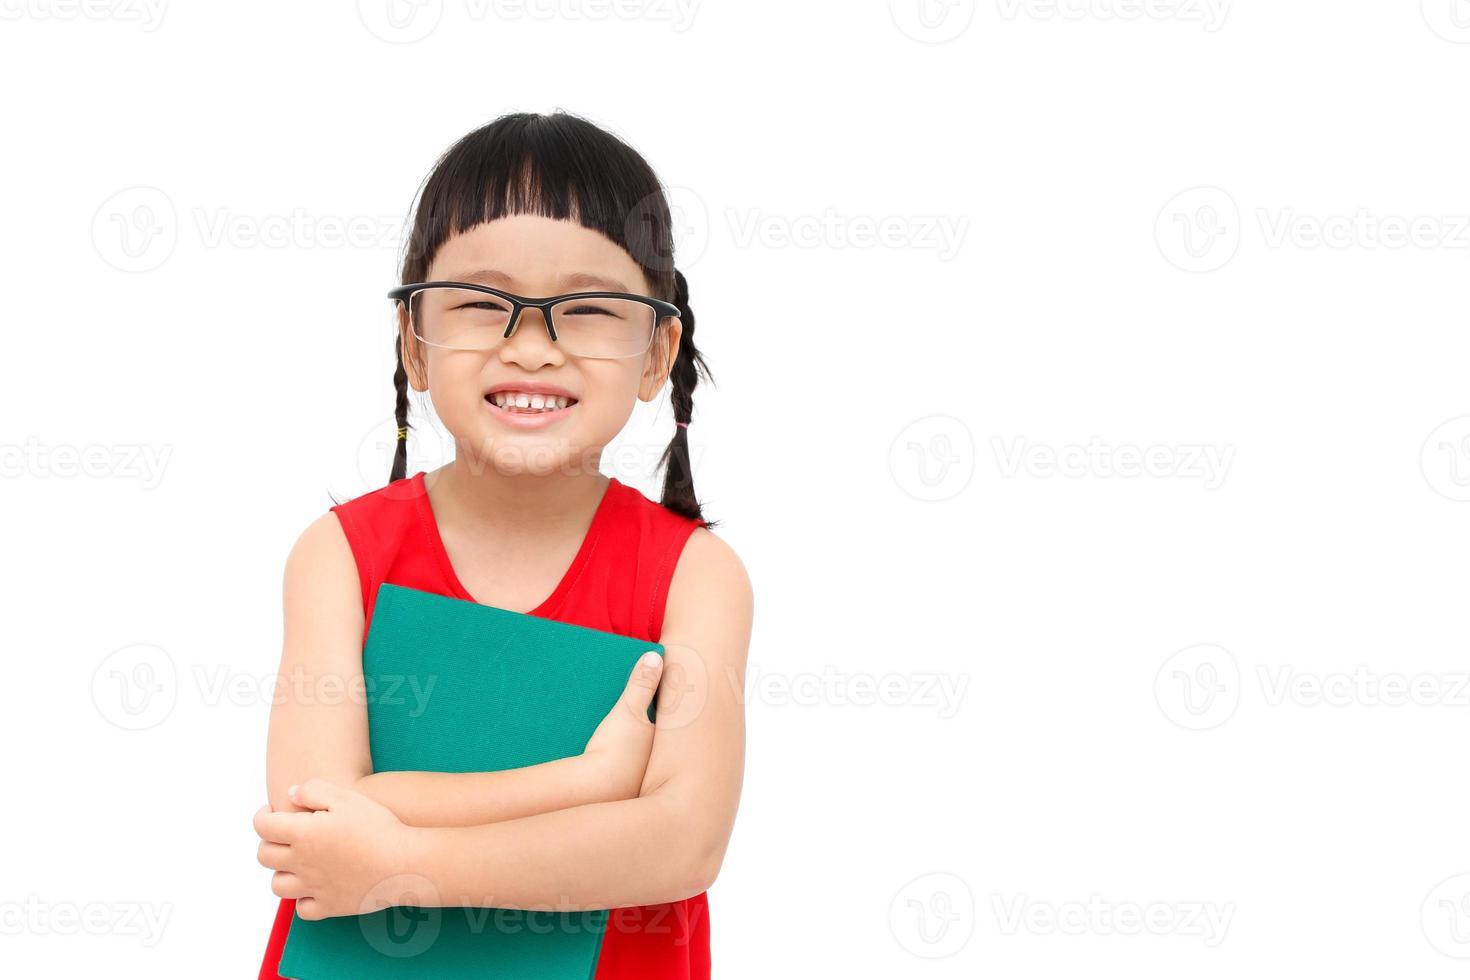 estudio chino foto